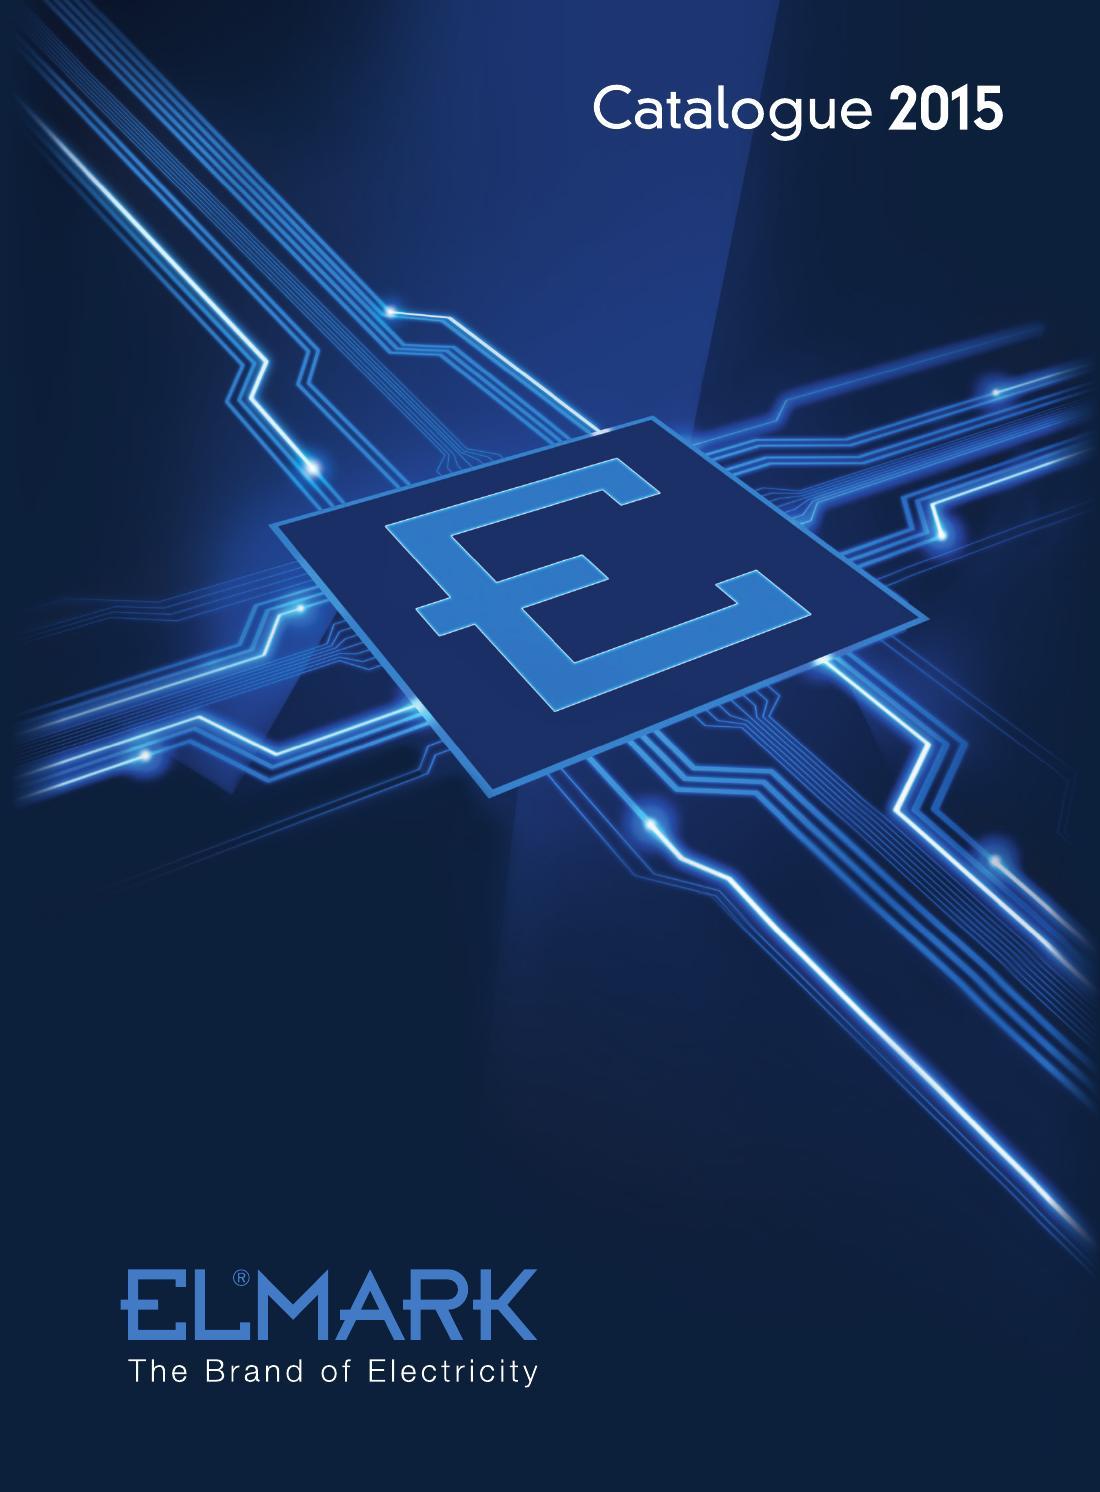 Catalogue ELMARK ELECTRICAL 2015 by ELMARK - issuu on